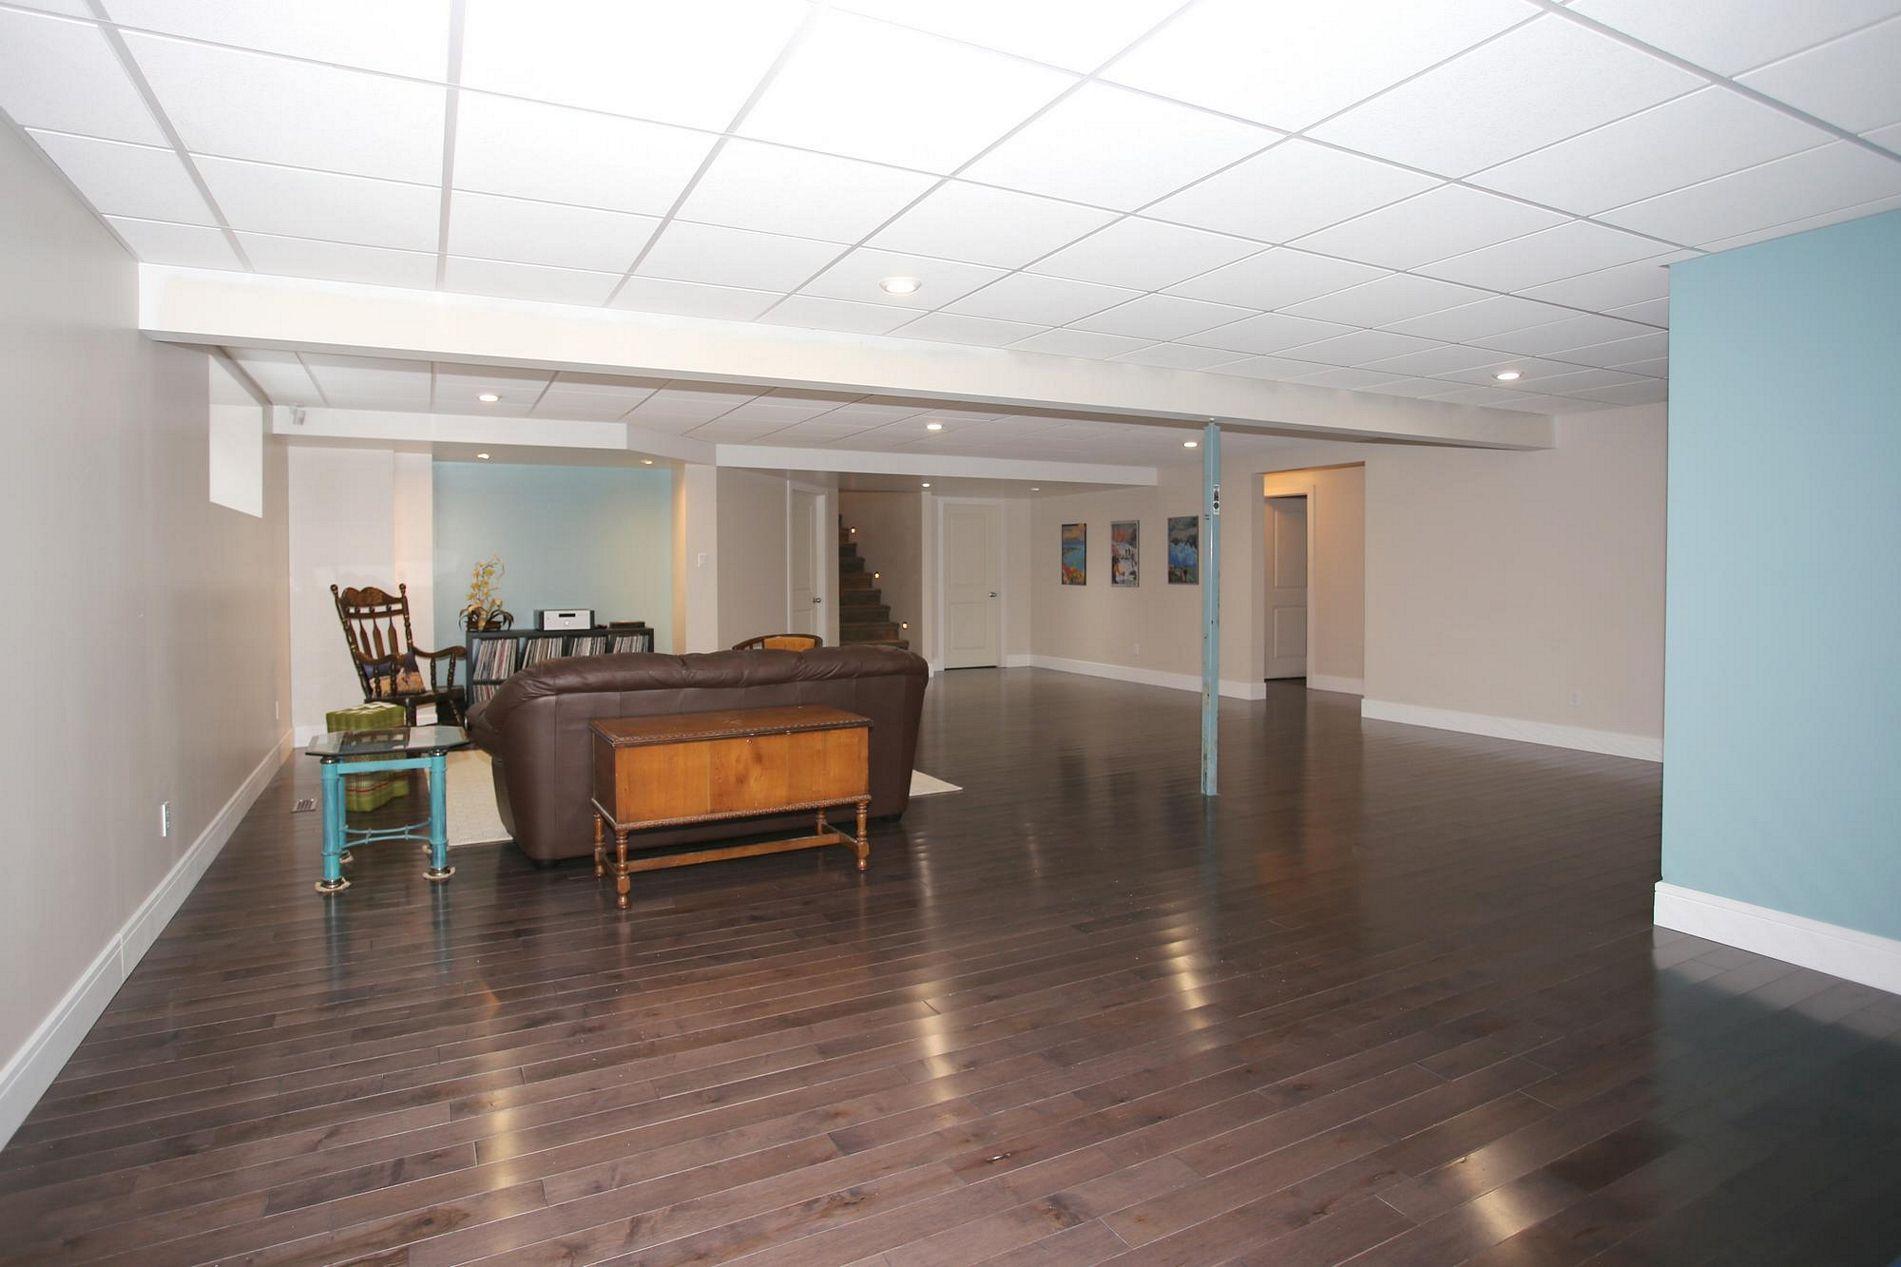 26 Edenwood Place, Winnipeg, Manitoba  R3X 0E4 - Photo 28 - 1831994